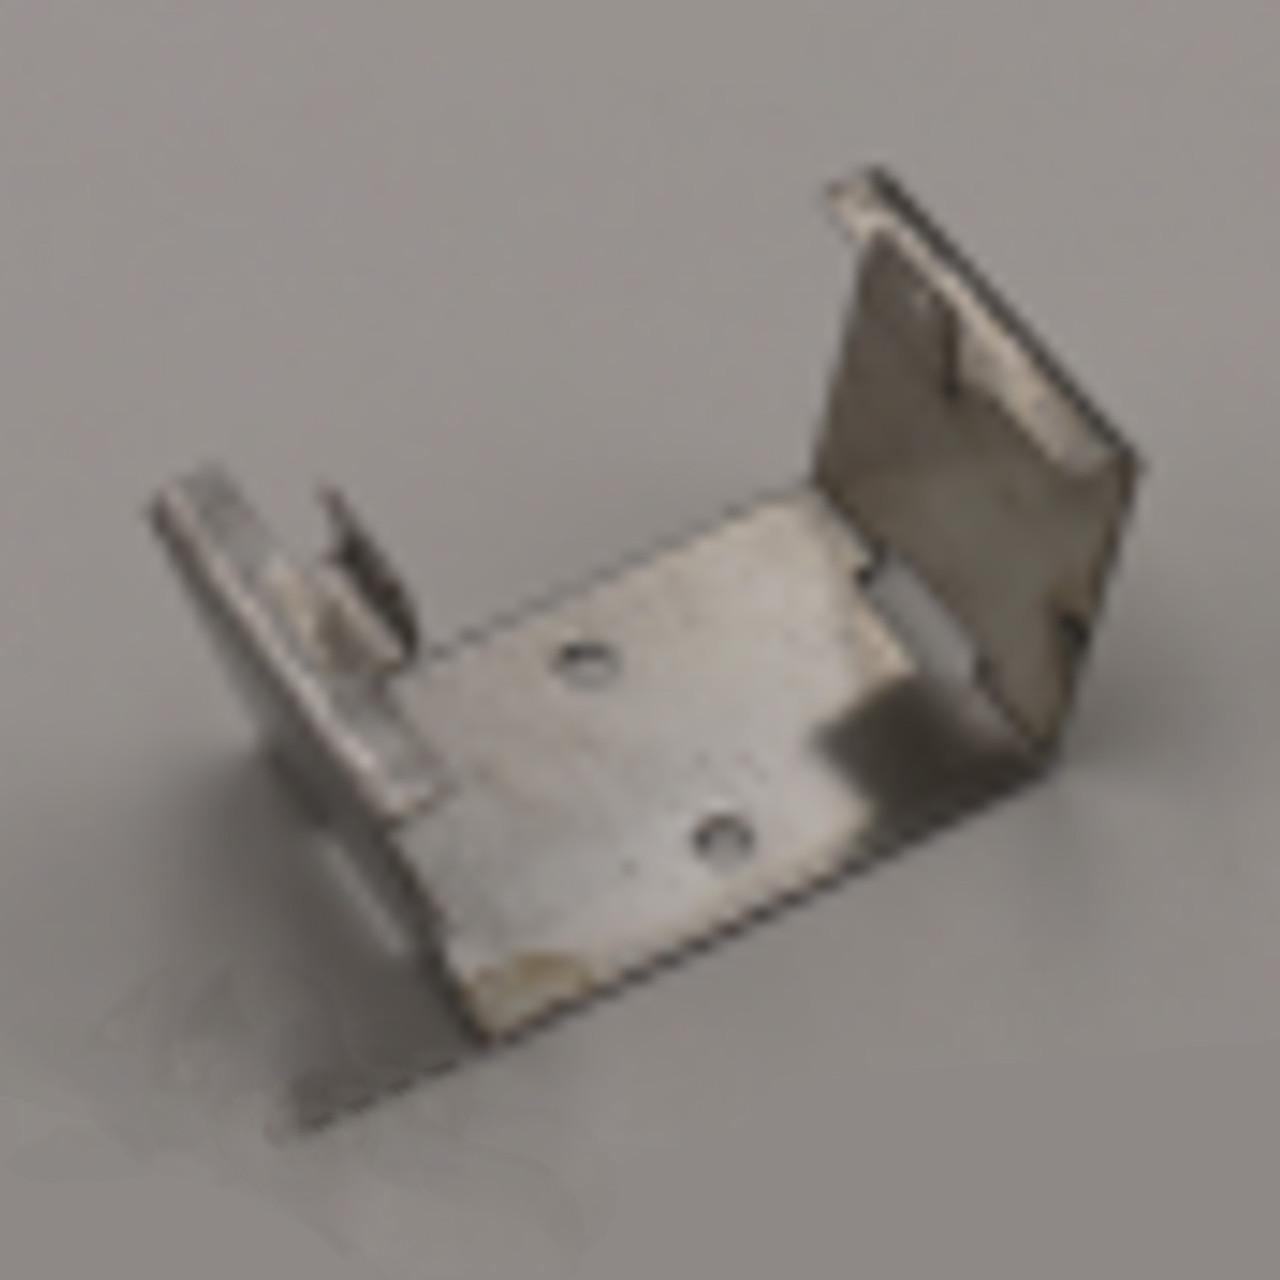 Клип крепление внутреннего профиля (MX 50x75B)